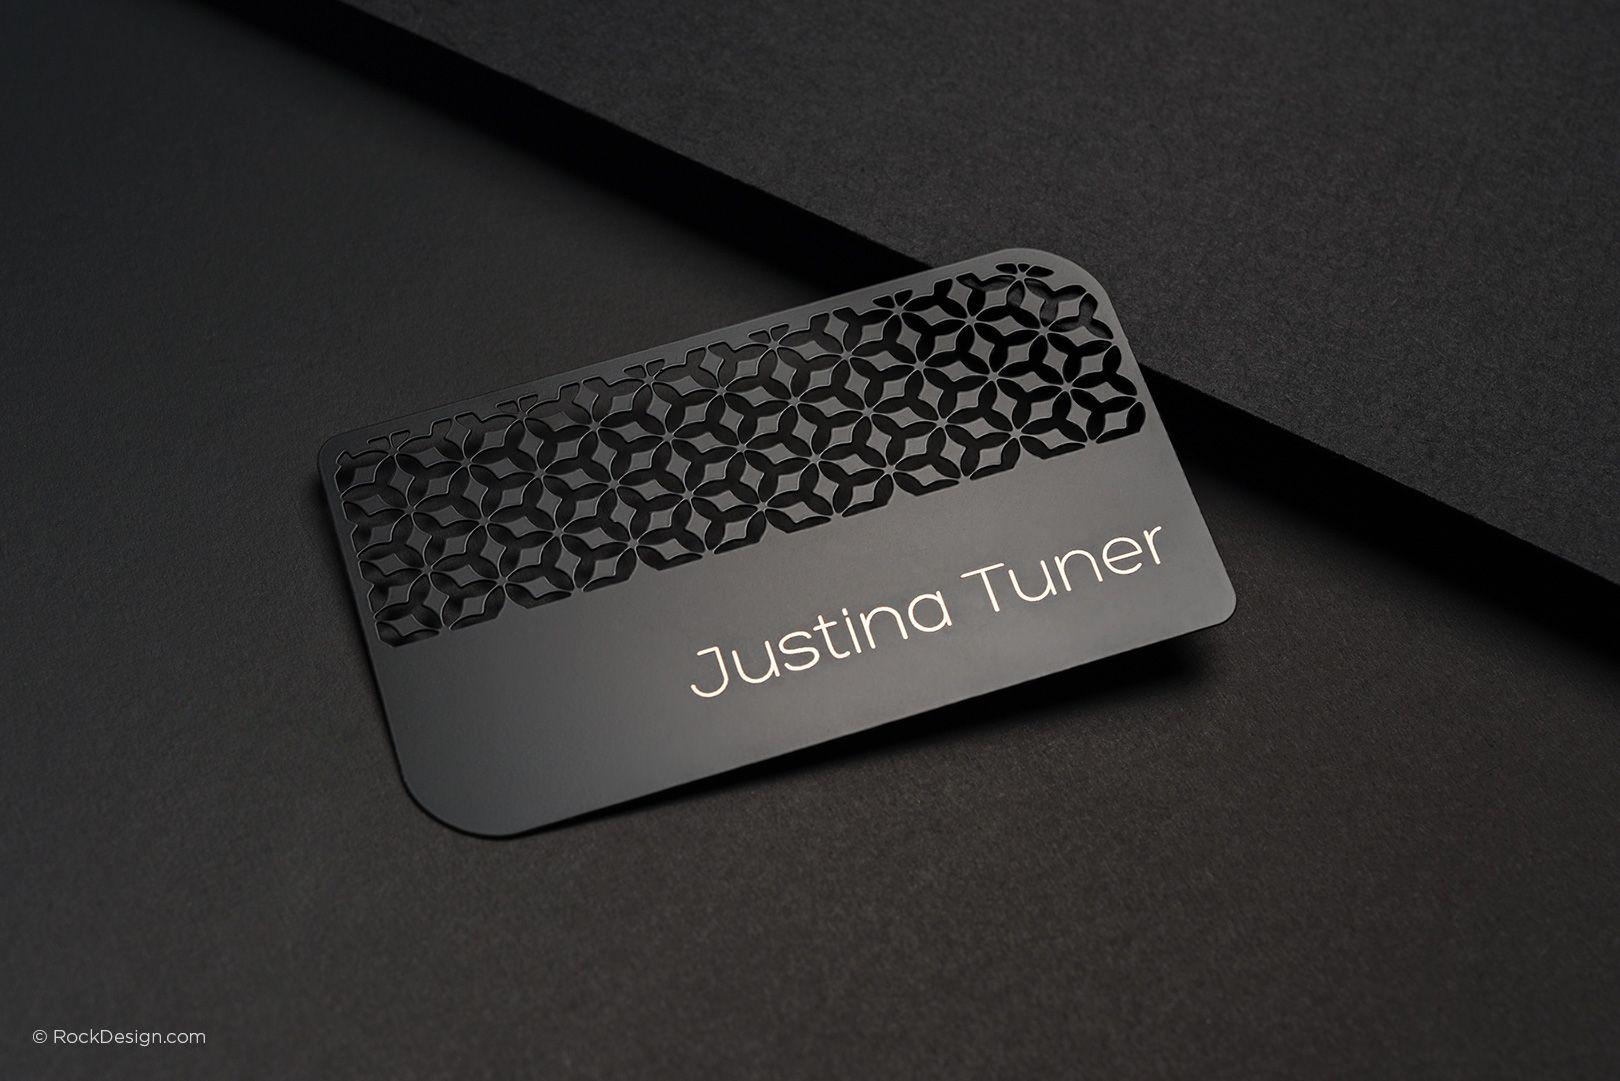 Quick Turnaround Time - Laser Engraved Black Metal Business Cards ...